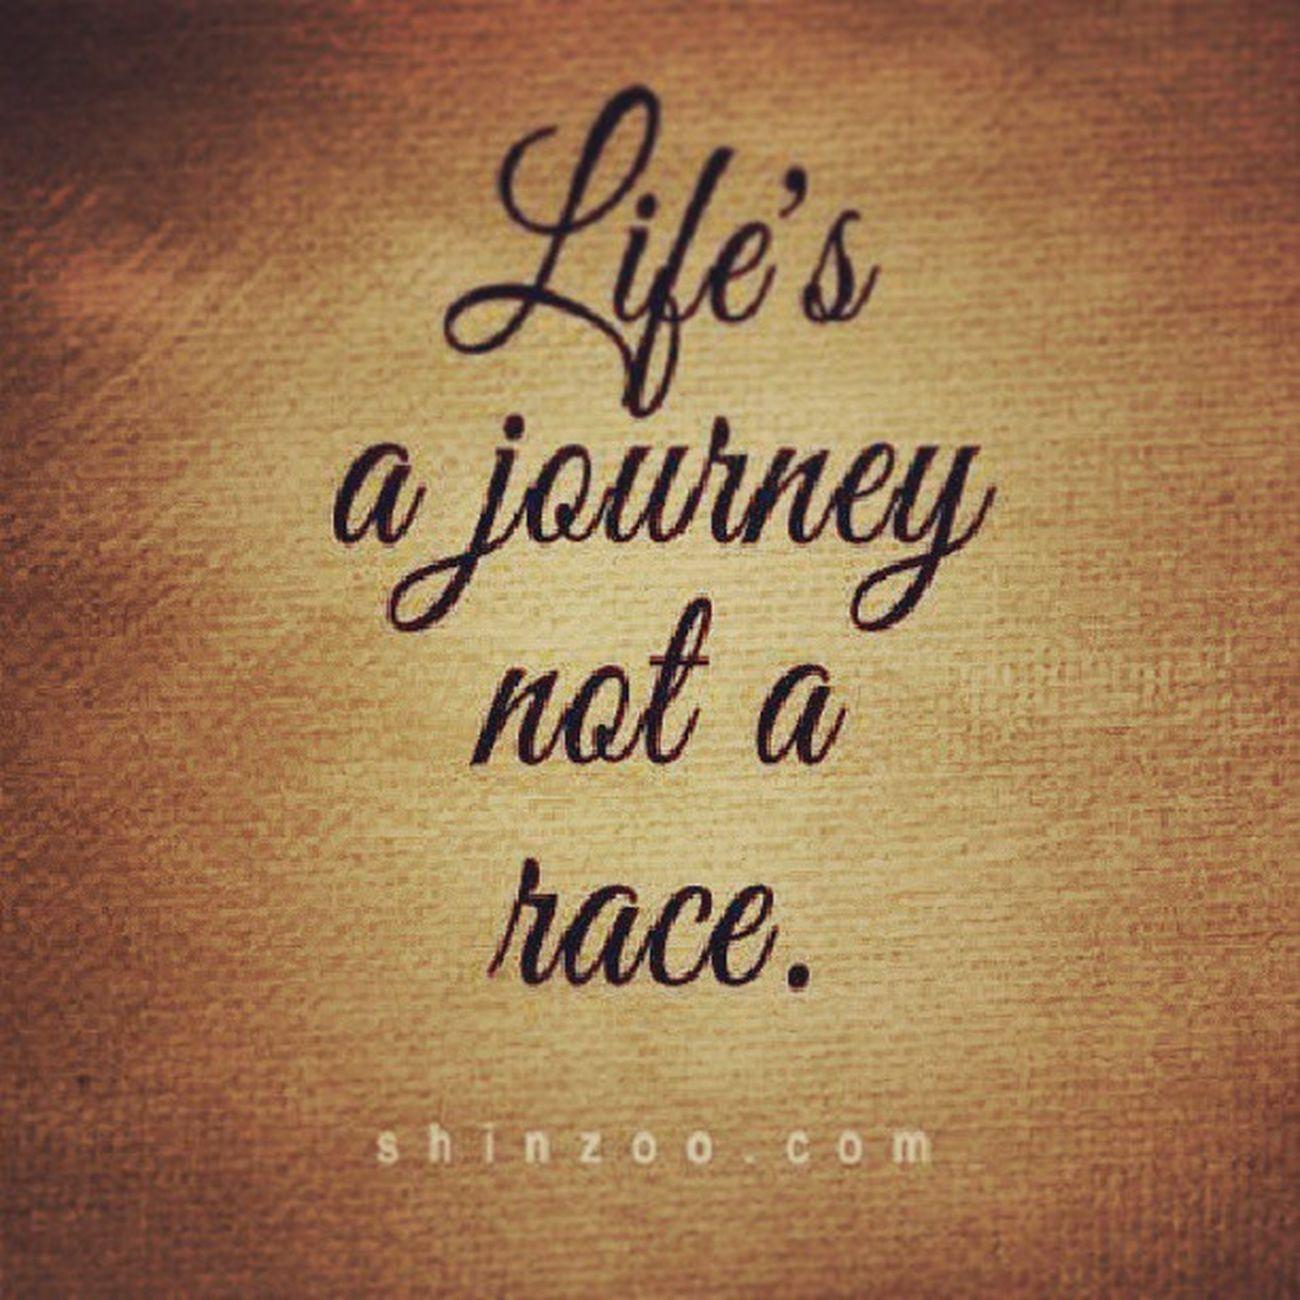 Enjoyit Liveit Life Journey HaveFun QuitBeingSoSerious